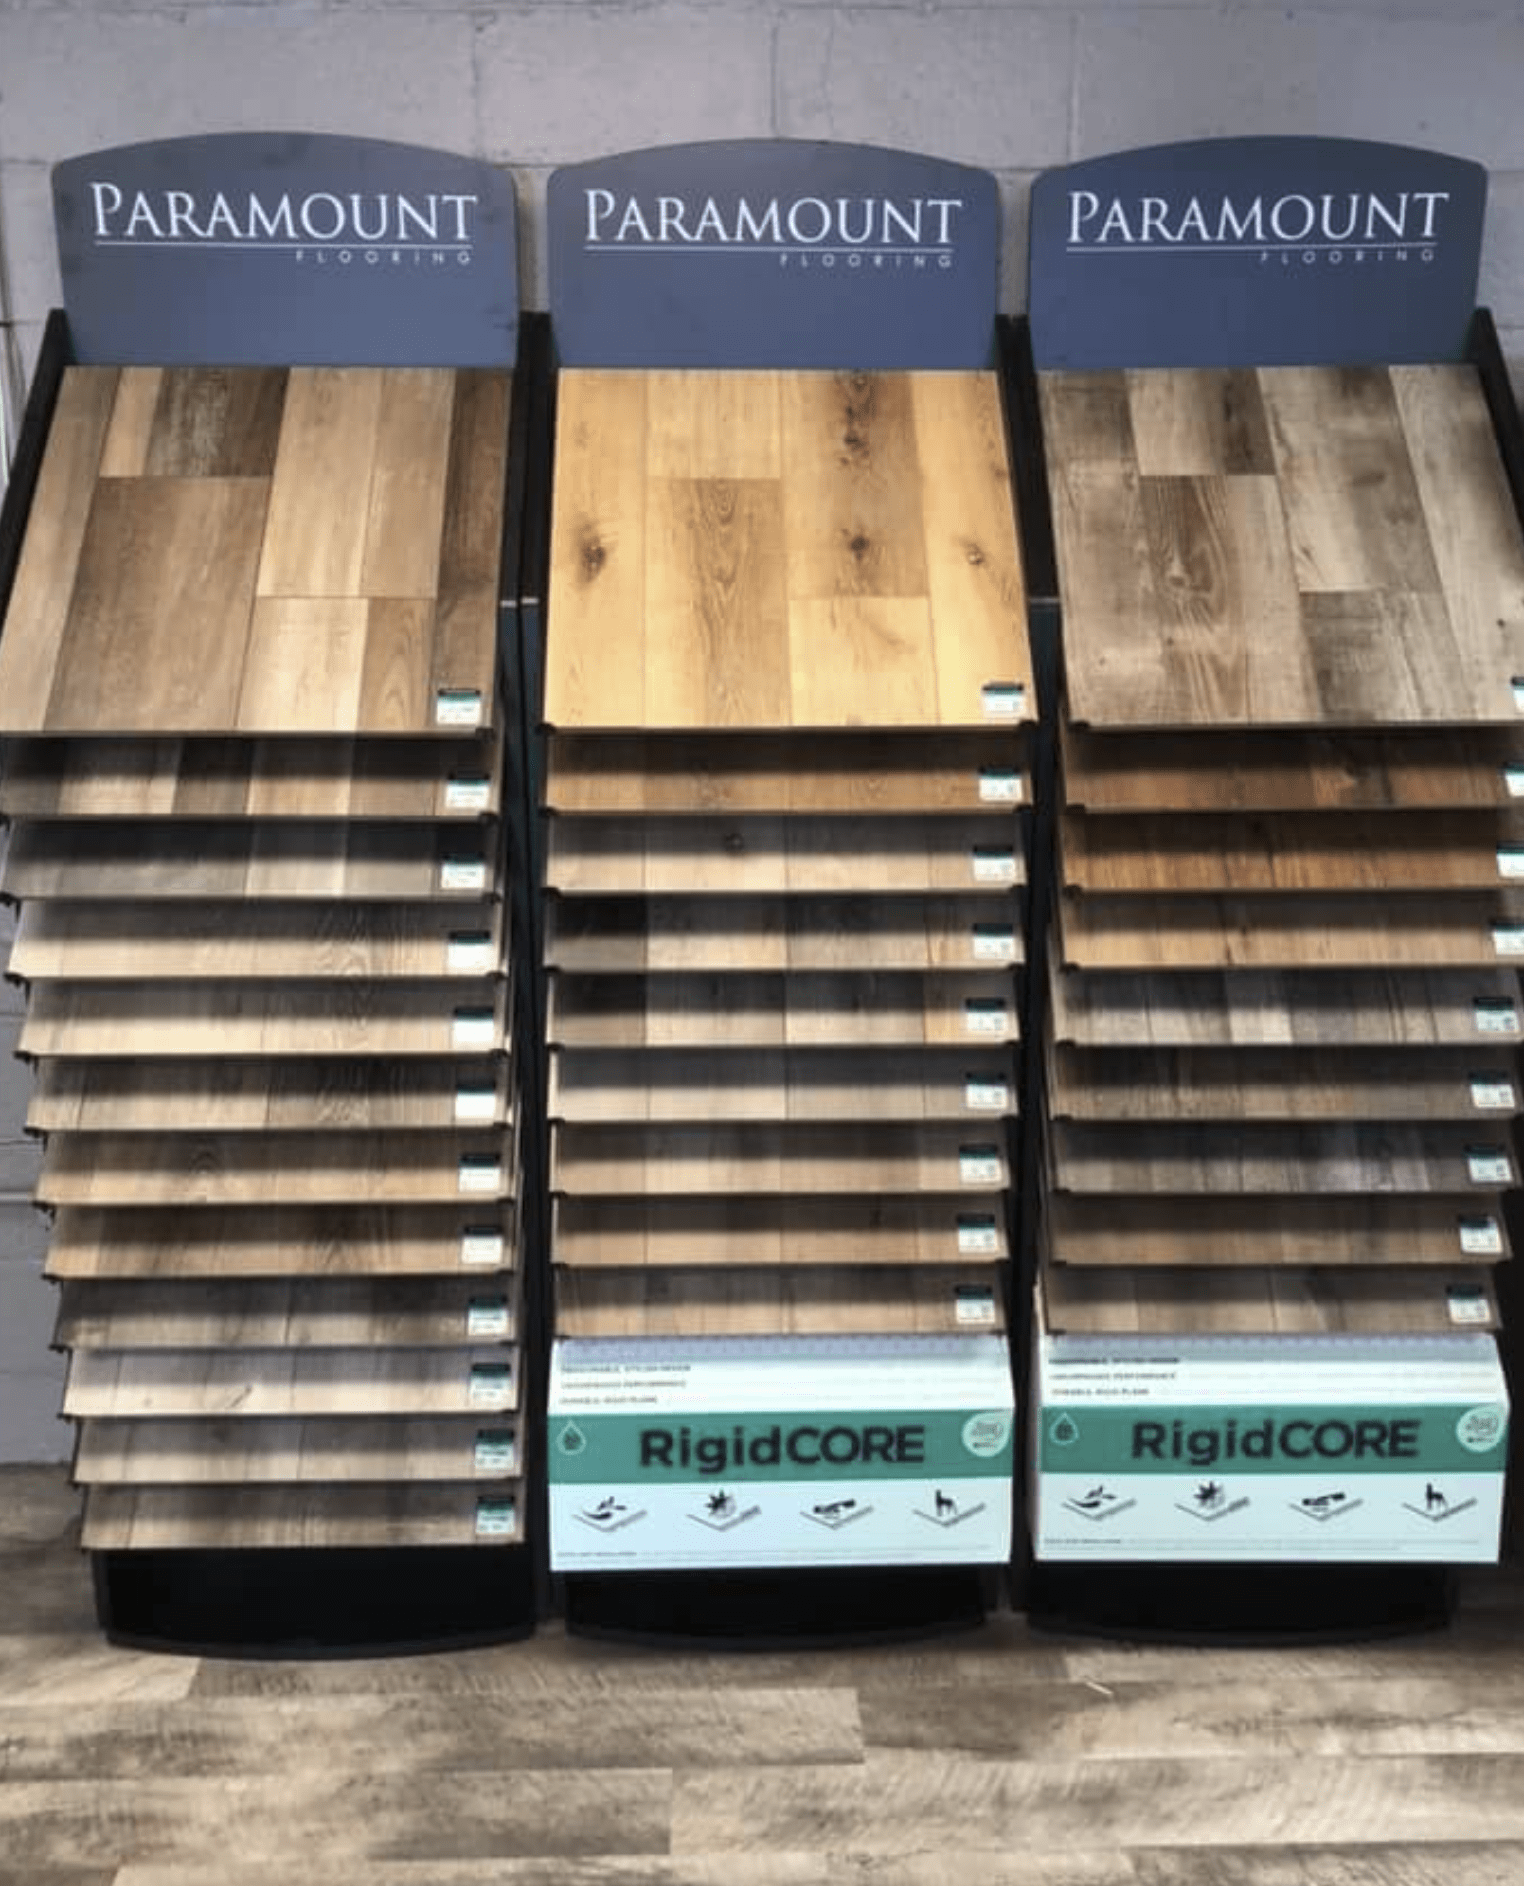 Paramount Flooring for your Overland Park, KS home from KC Floorworx